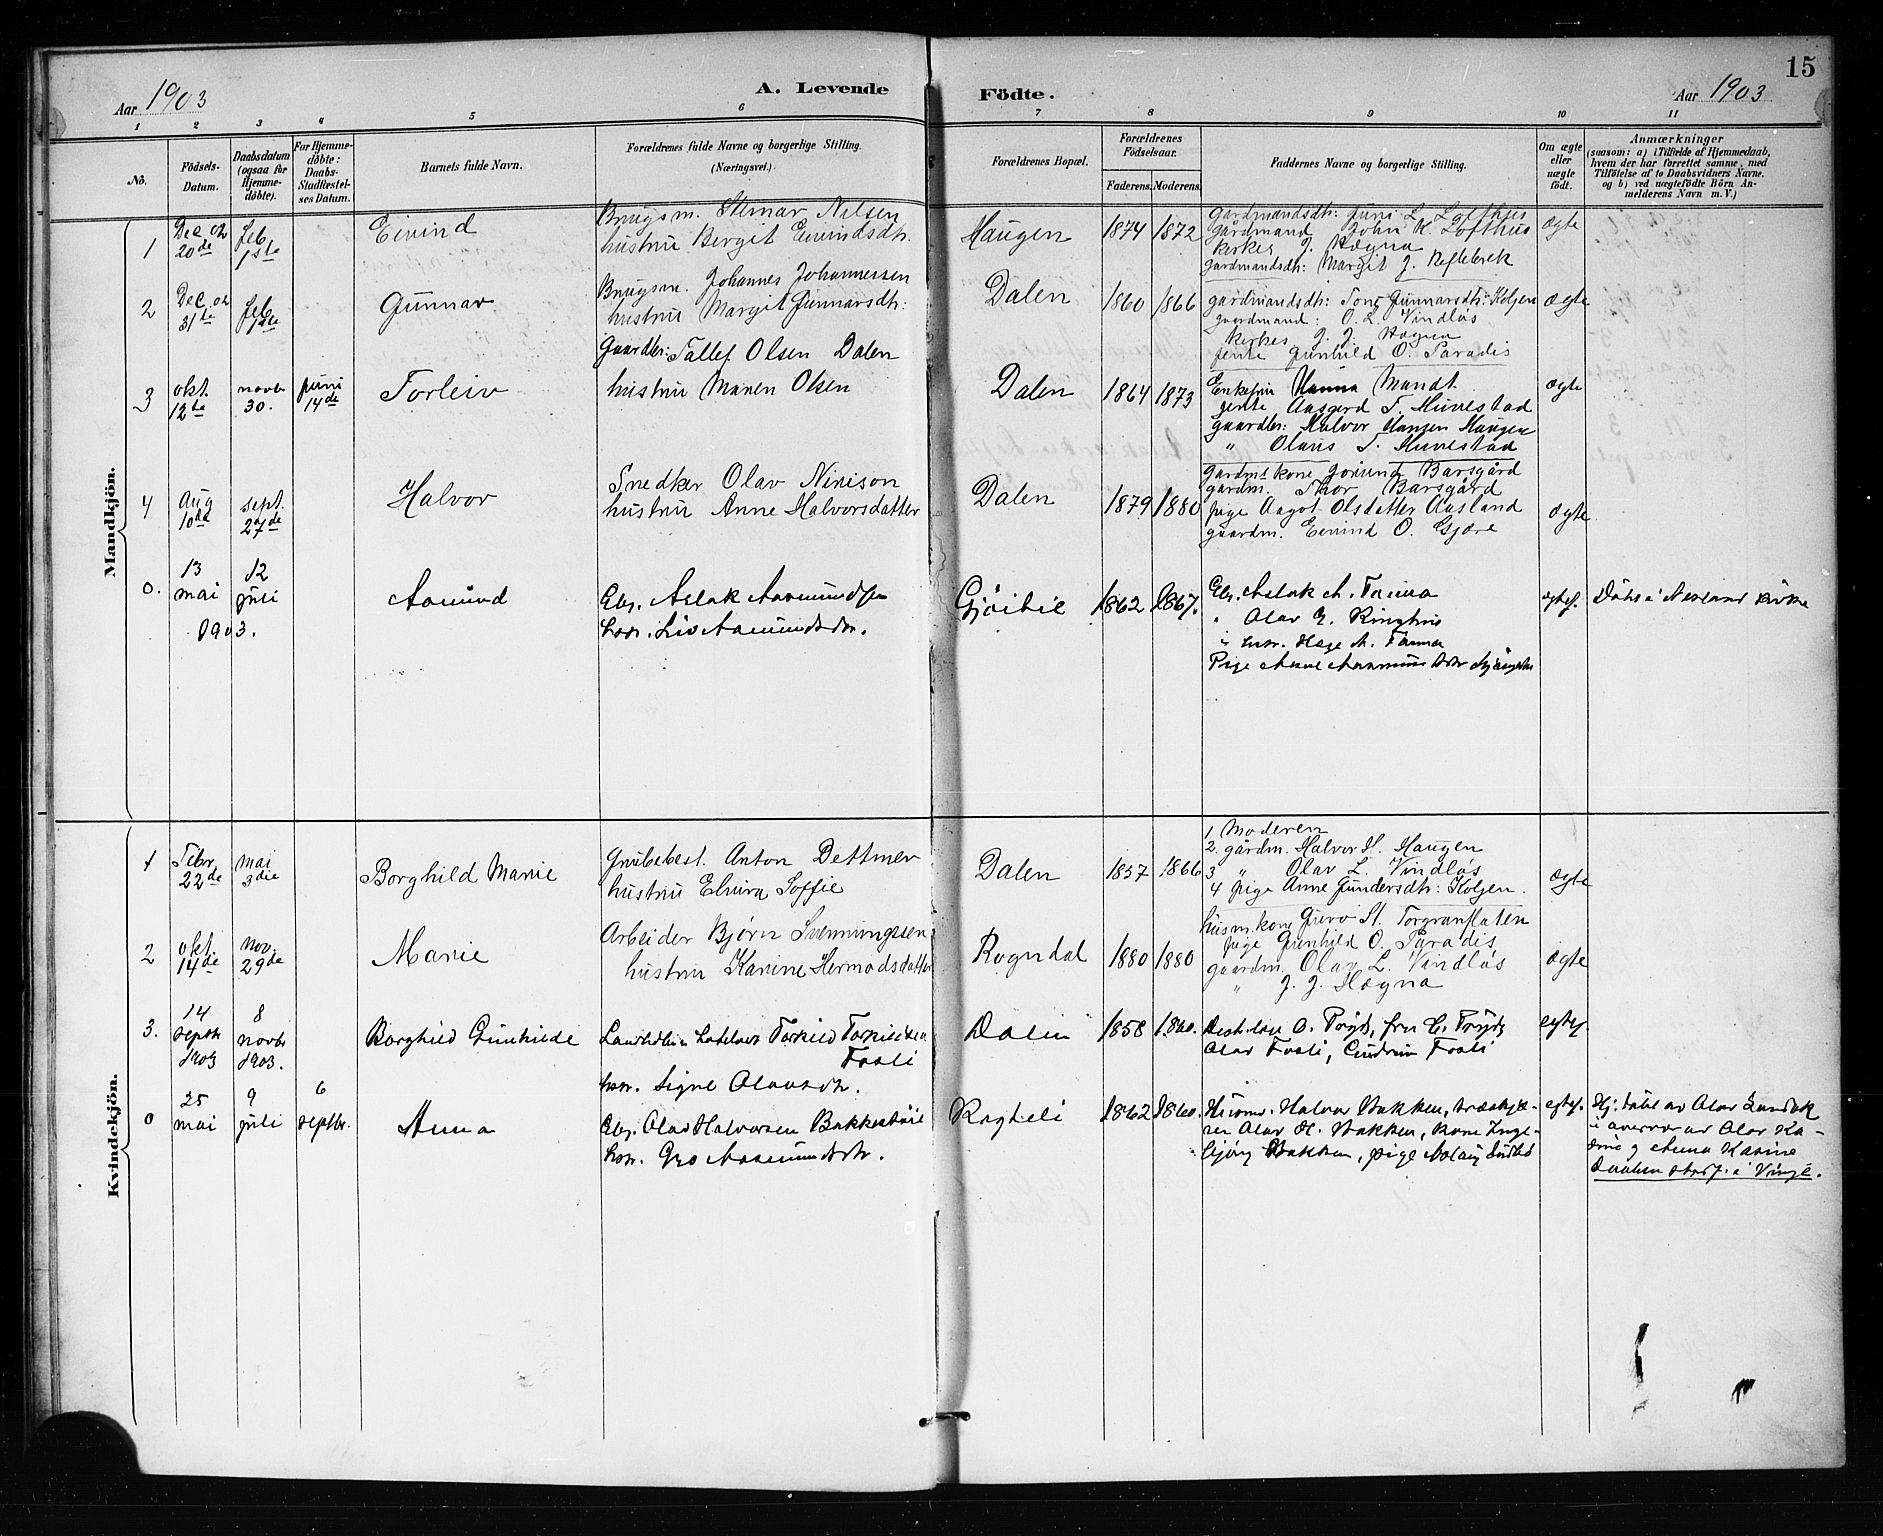 SAKO, Lårdal kirkebøker, G/Gb/L0003: Klokkerbok nr. II 3, 1889-1920, s. 15